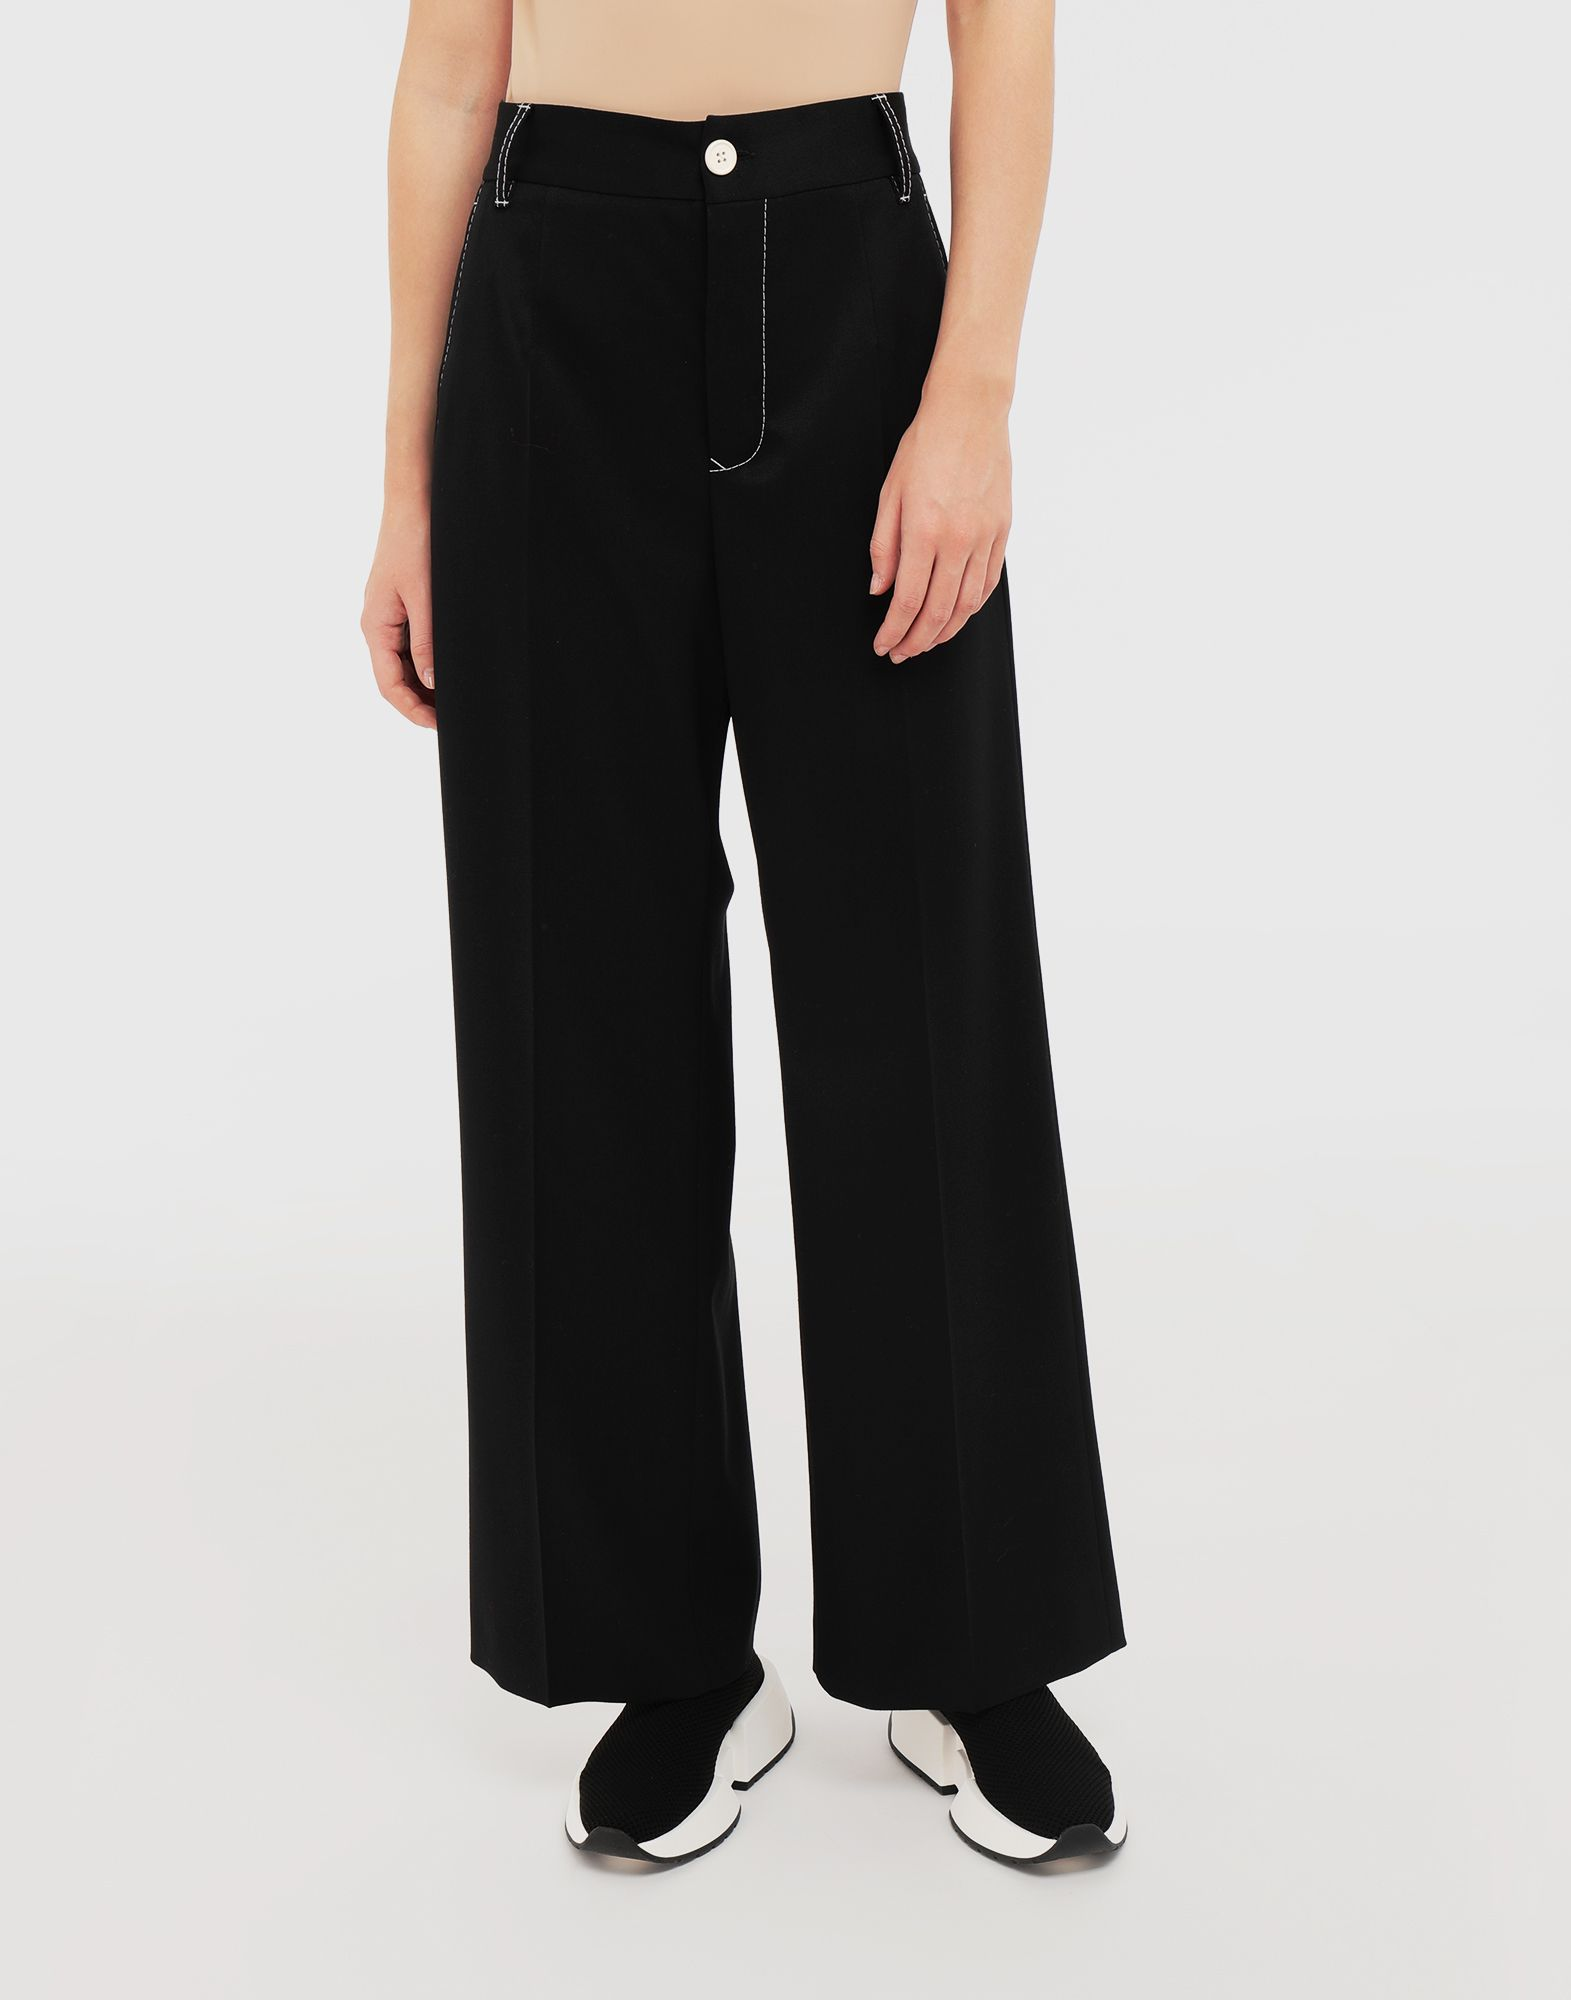 MM6 MAISON MARGIELA Casual wool-blend pants Casual pants Woman r